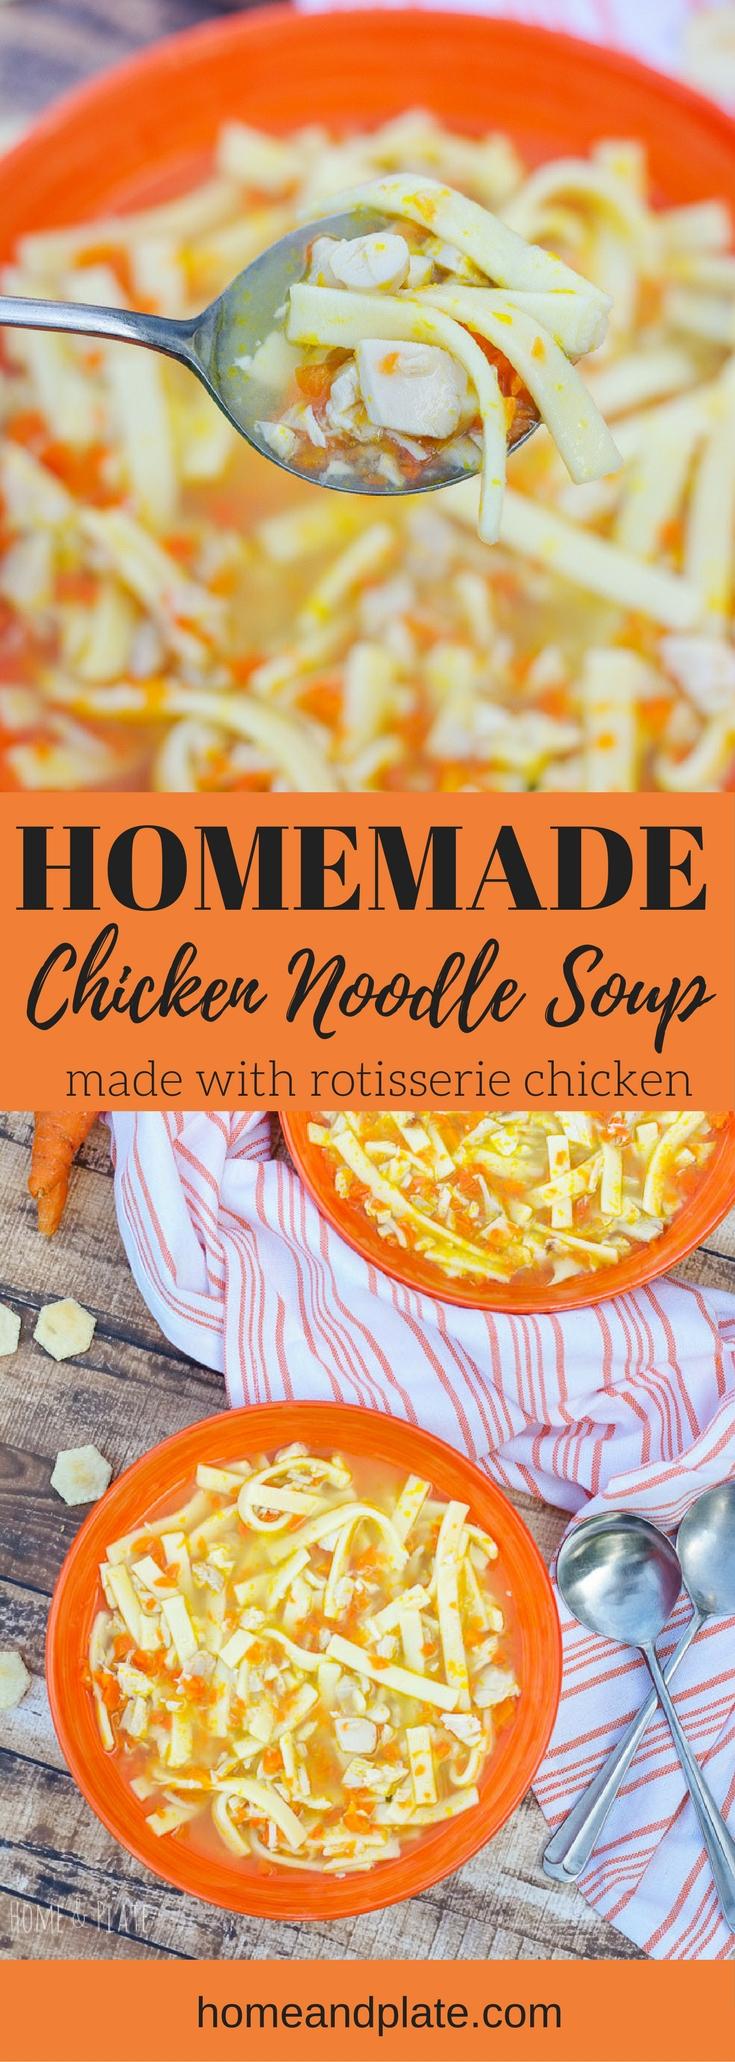 Homemade Chicken Noodle Soup   www.homeandplate.com   Whip up this easy homemade chicken noodle soup in under 30 minutes using rotisserie chicken.